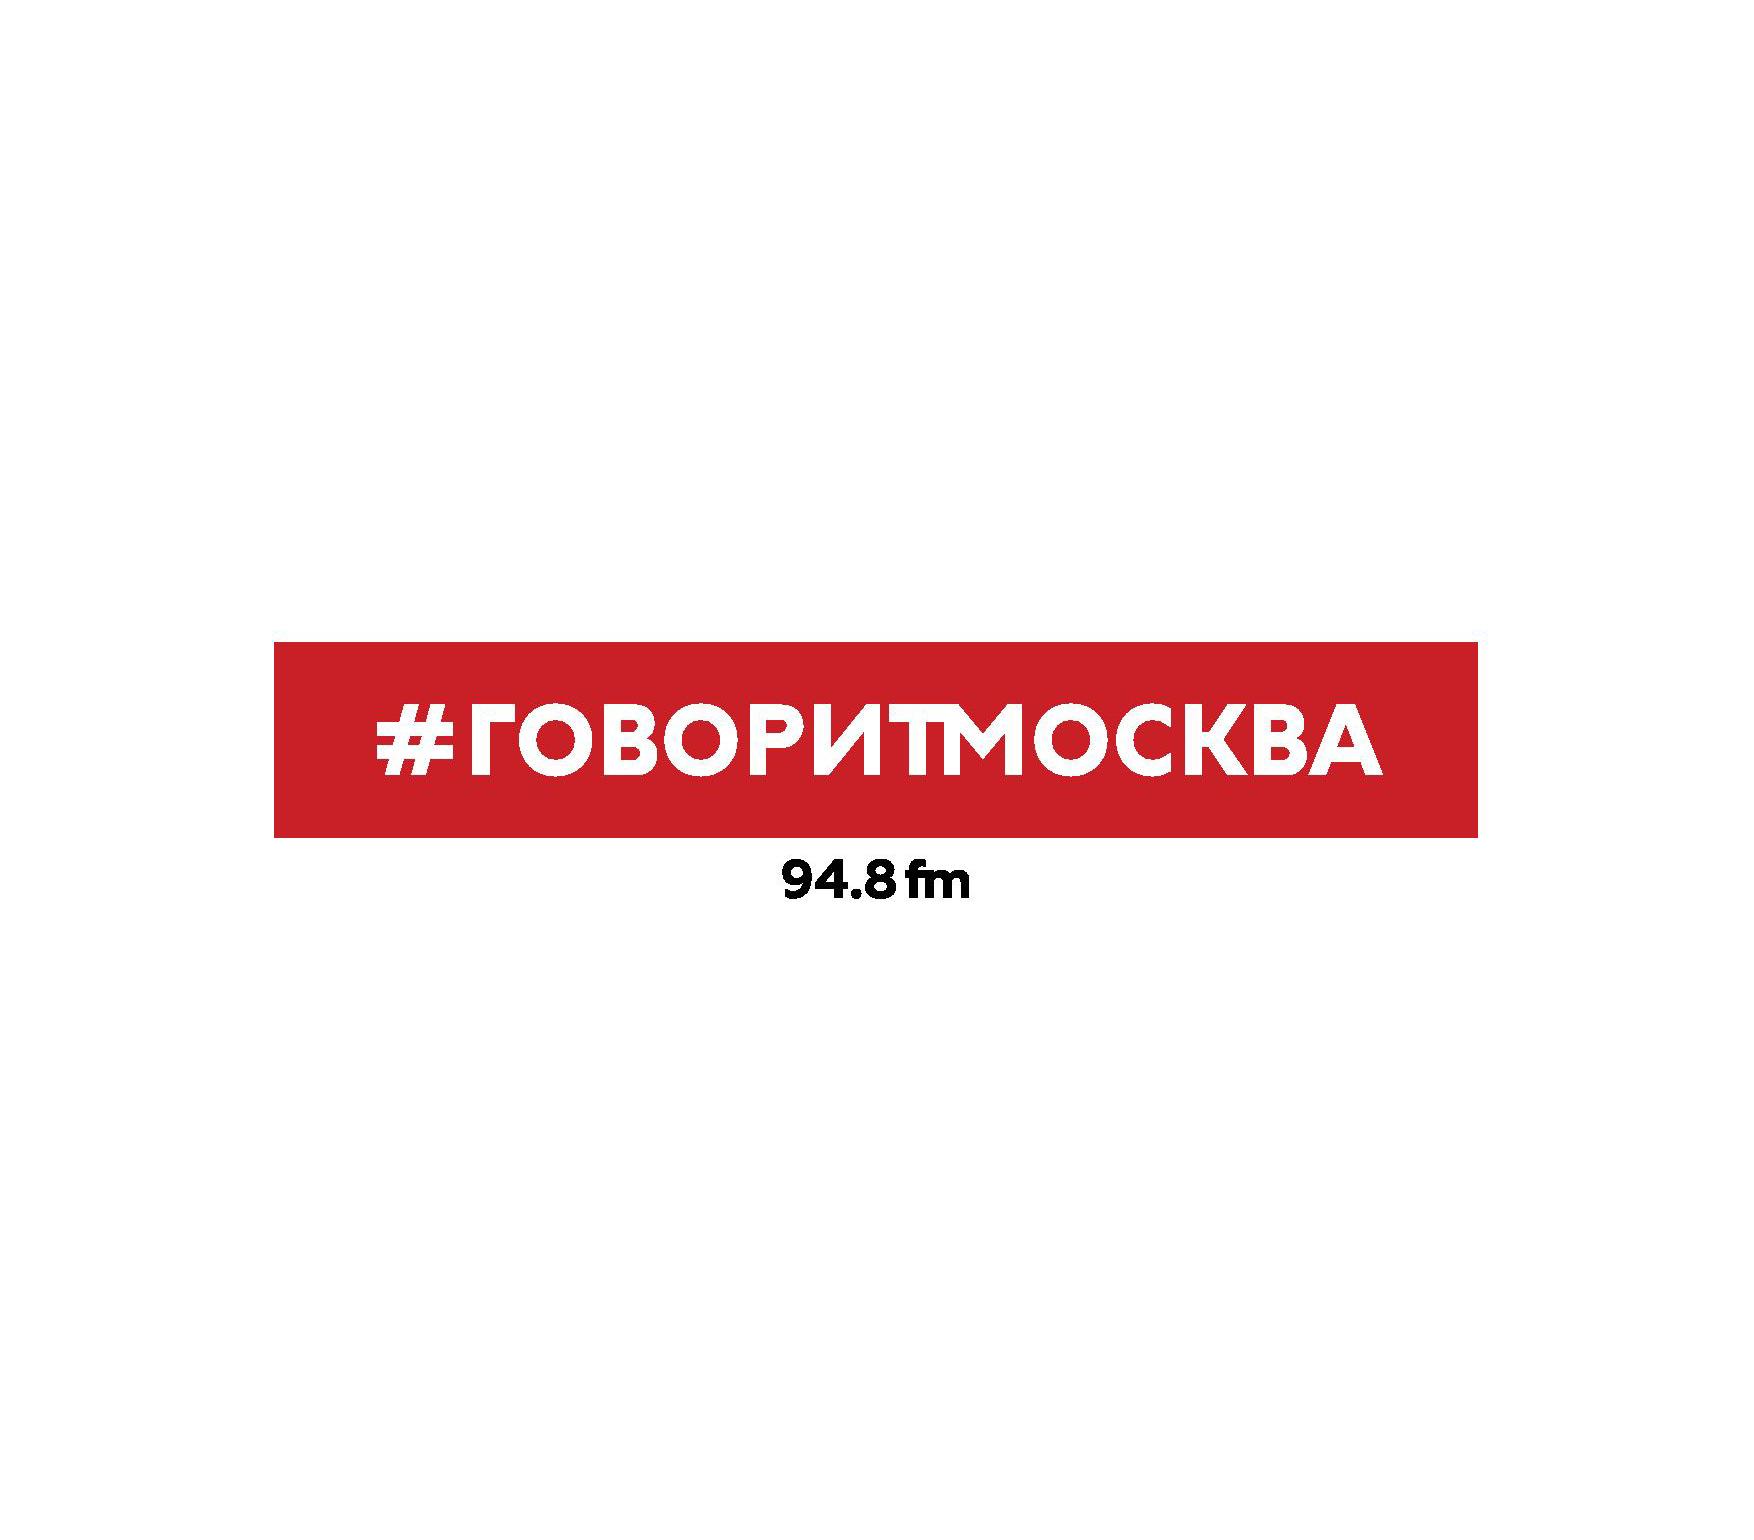 Макс Челноков 9 мая. Юрий Левитан макс челноков 4 мая валерий меладзе